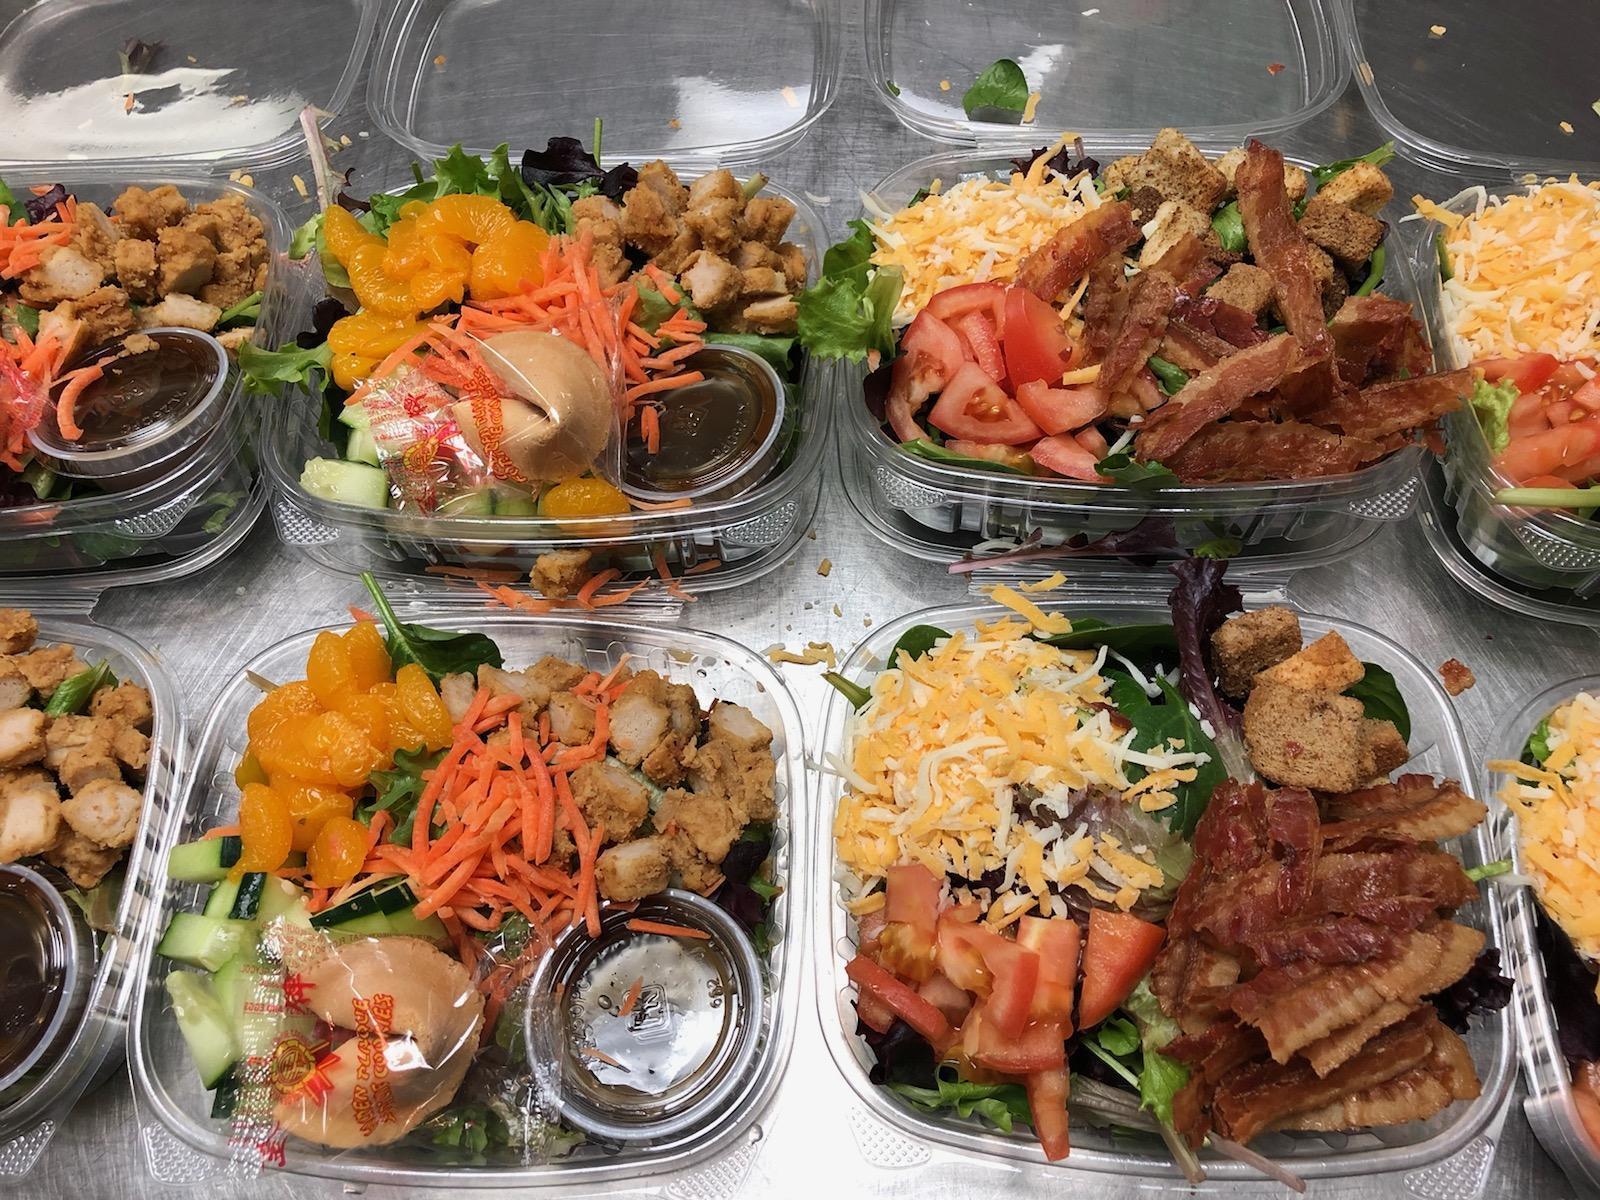 Bird's Nest Cafe - Fresh Salads